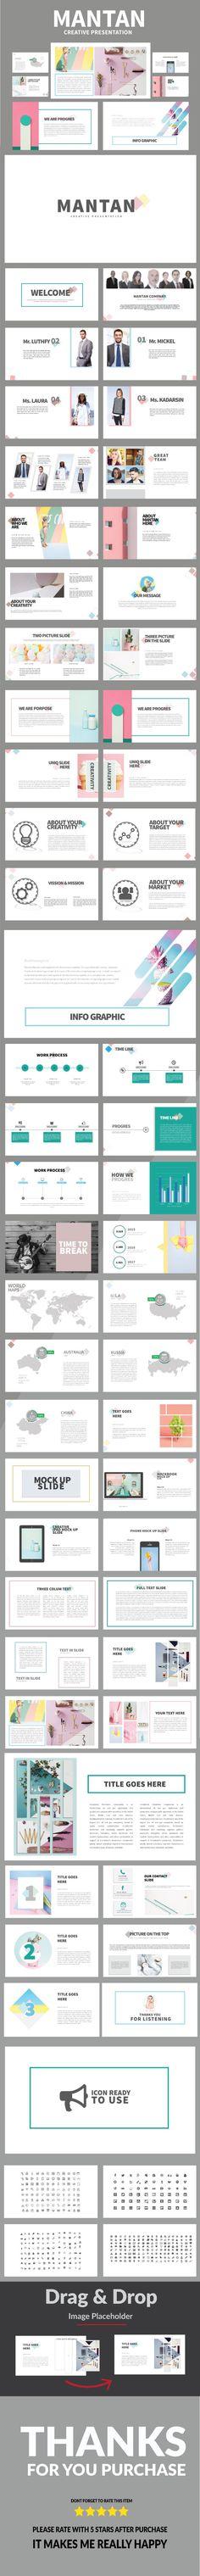 Mantan Multipurpose Powerpoint - PowerPoint Templates Presentation Templates